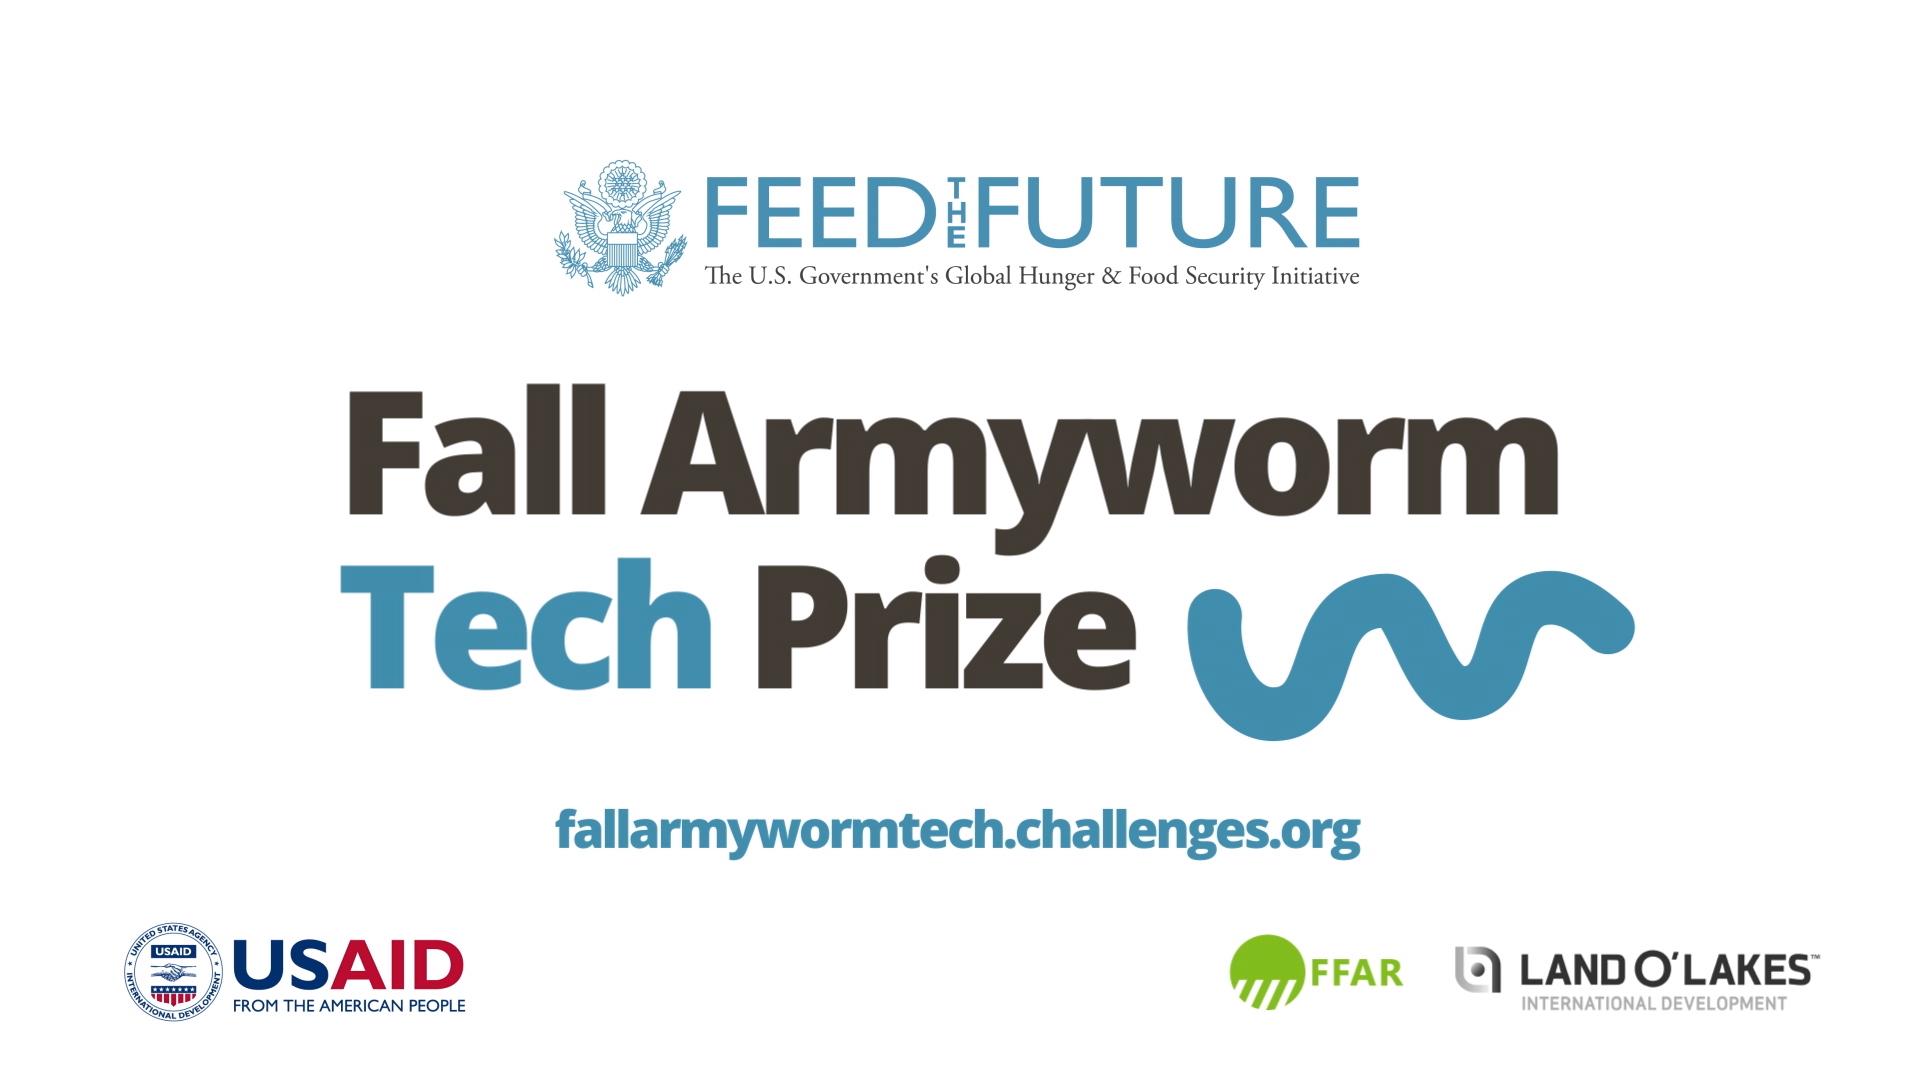 Uganda, Nigeria, US top entries for Fall Armyworm Tech Prize